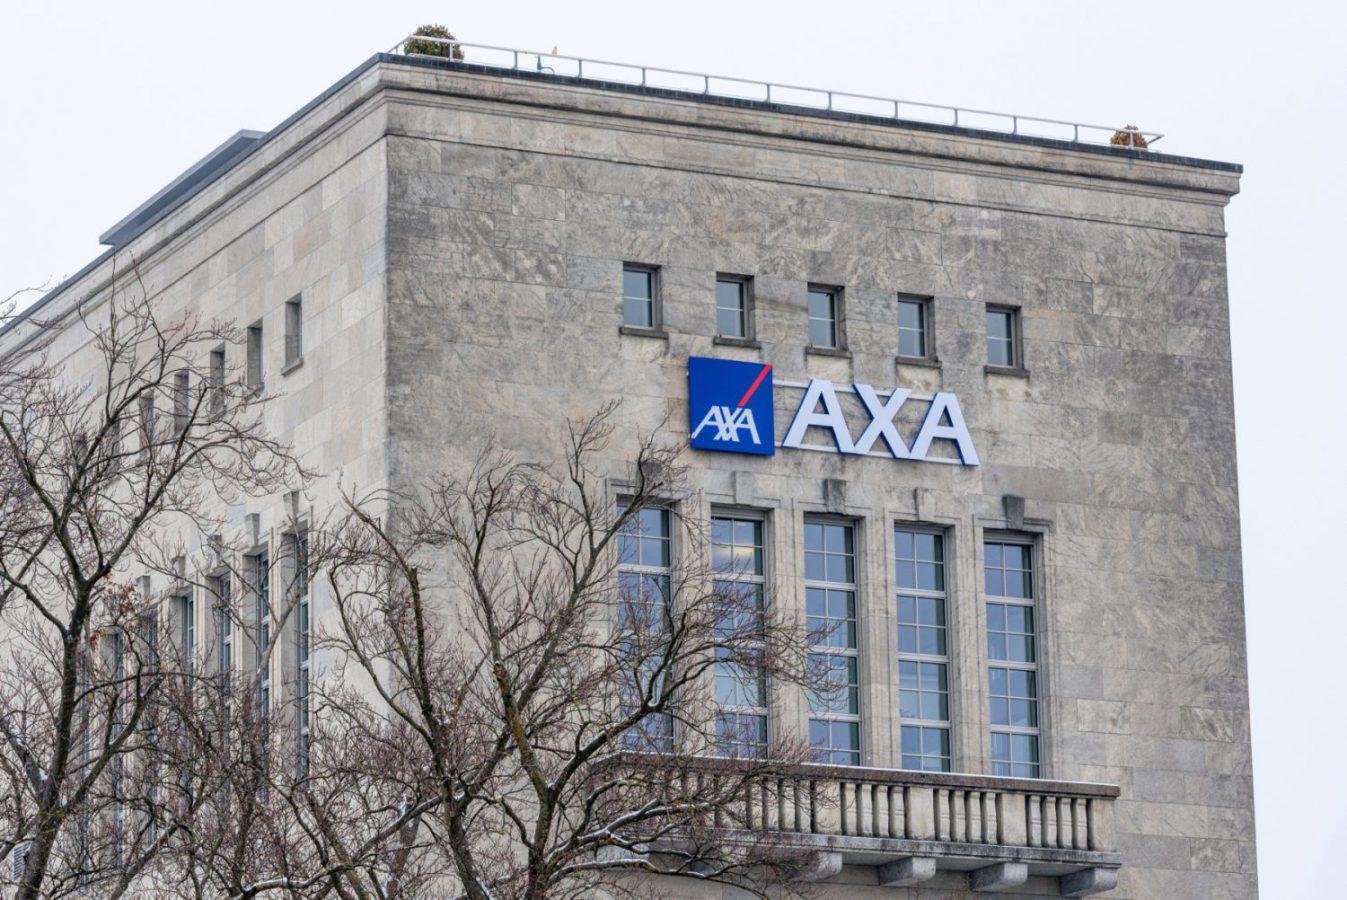 AXA Winterthur, finisce un'era: la compagnia elvetica diventa semplicemente AXA